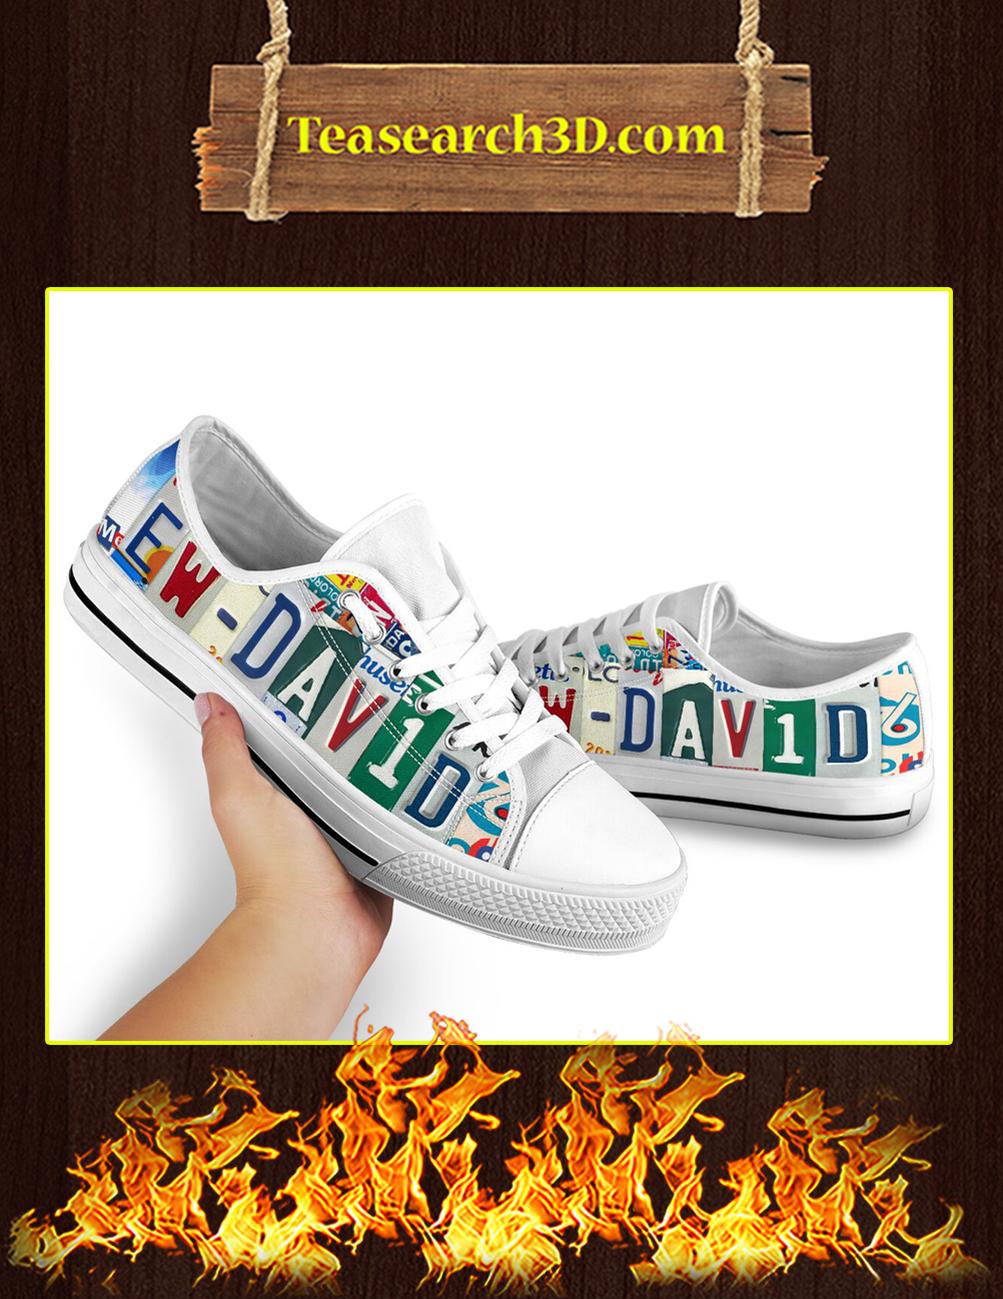 Ew David Low Top Shoes pic 2